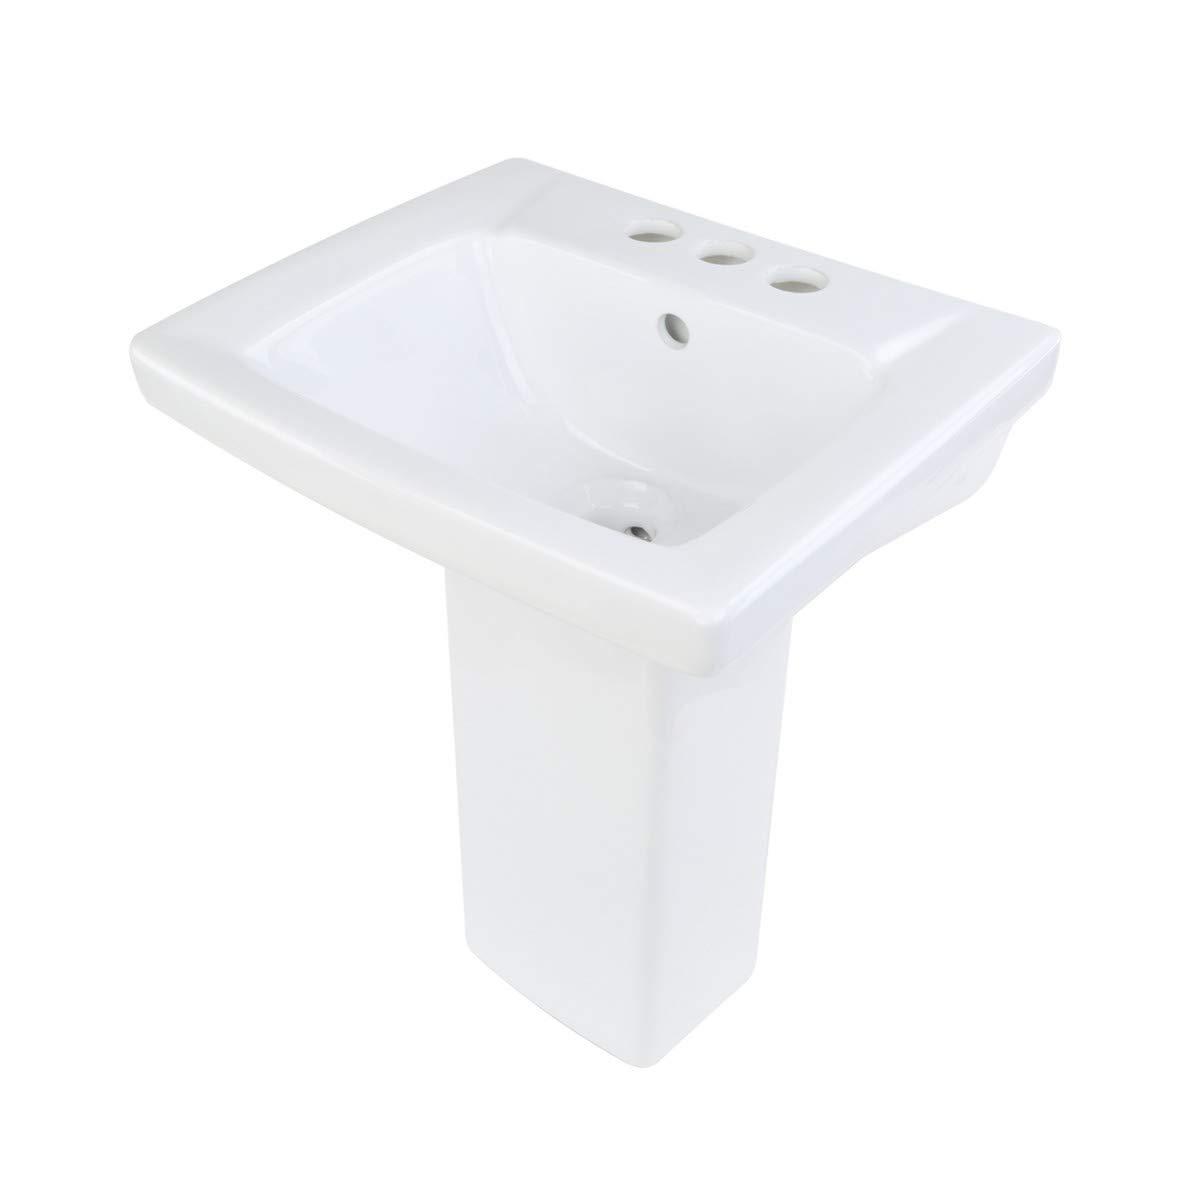 "Children's White Pedestal Sink Vitreous China""WeeWash"" 4"" Centerset Open Back Scratch Stain Resist"